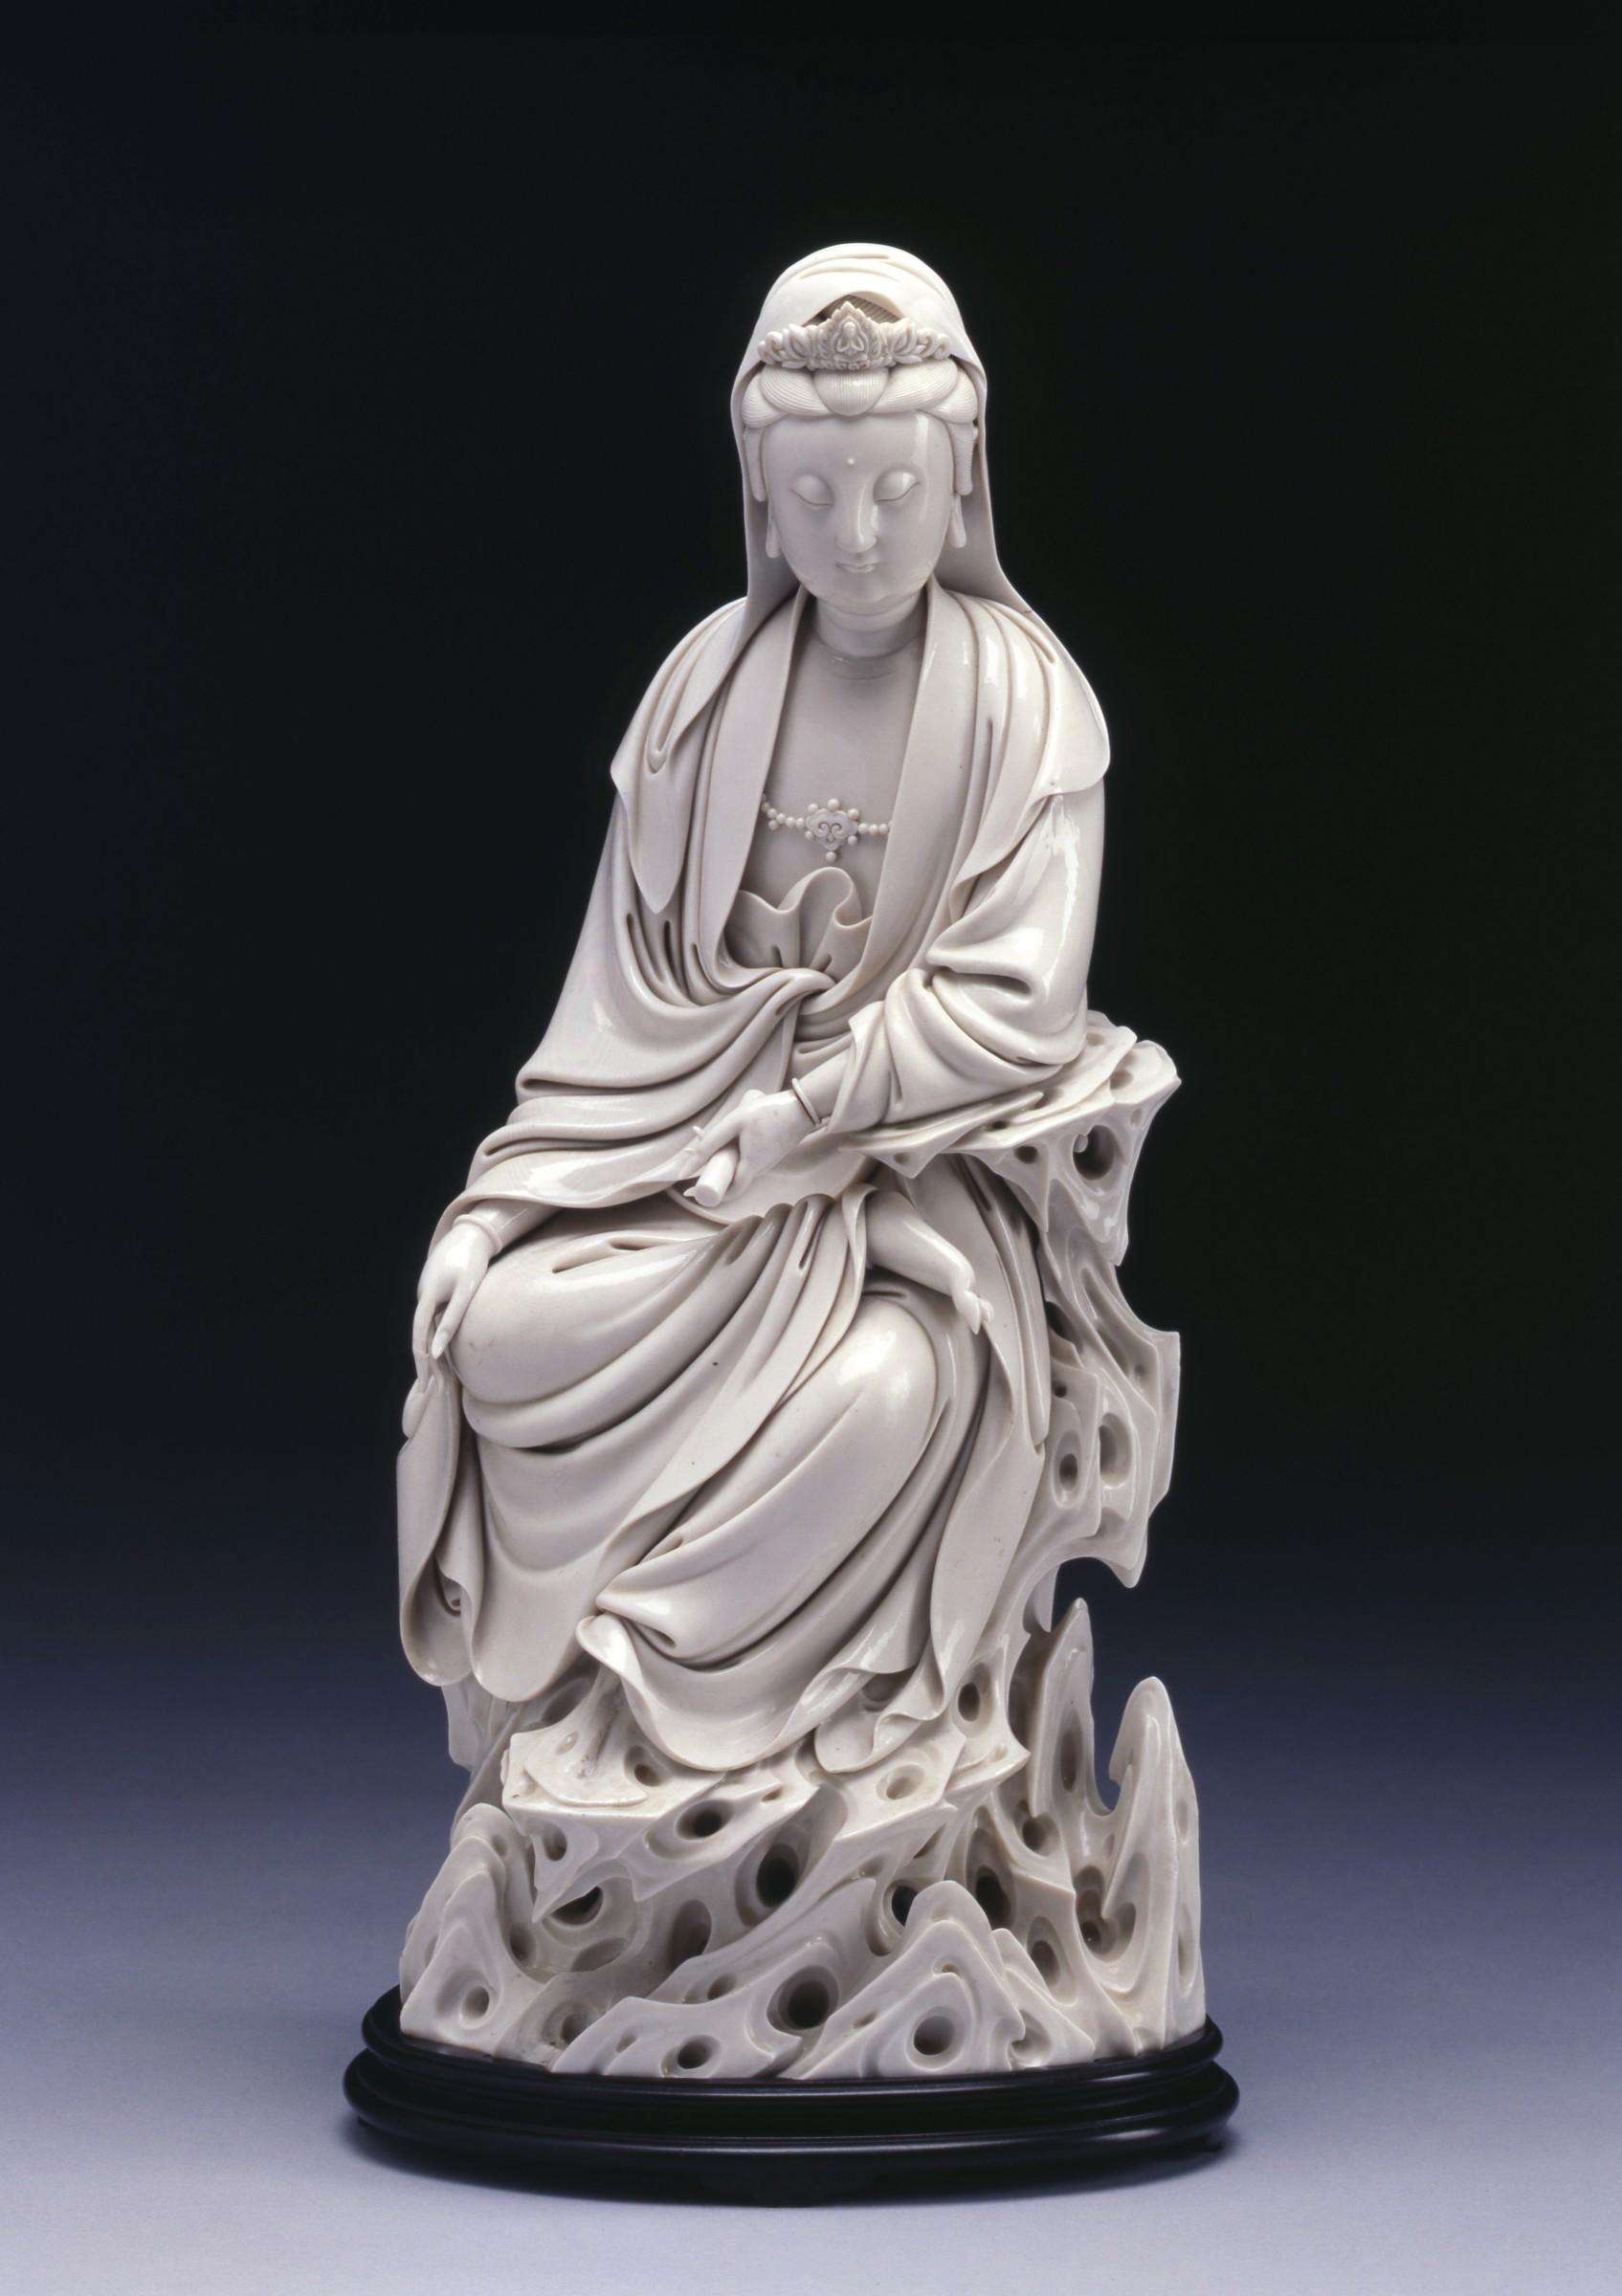 Dehua white porcelain guanyin mercy guanyin bodhisattva statue in China